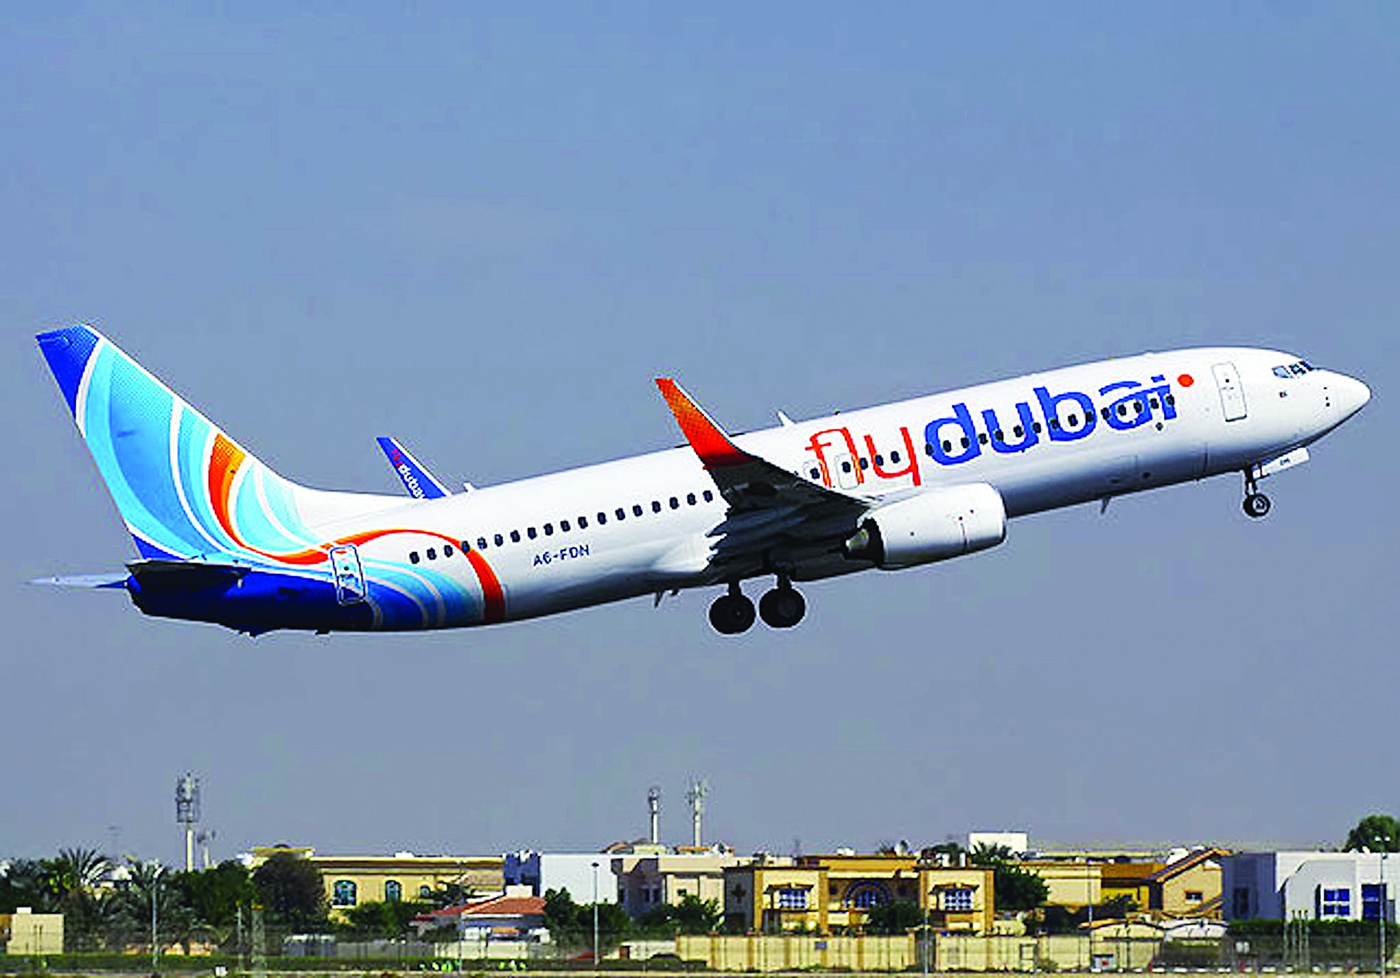 Flydubai operates return flights to 13 destinations